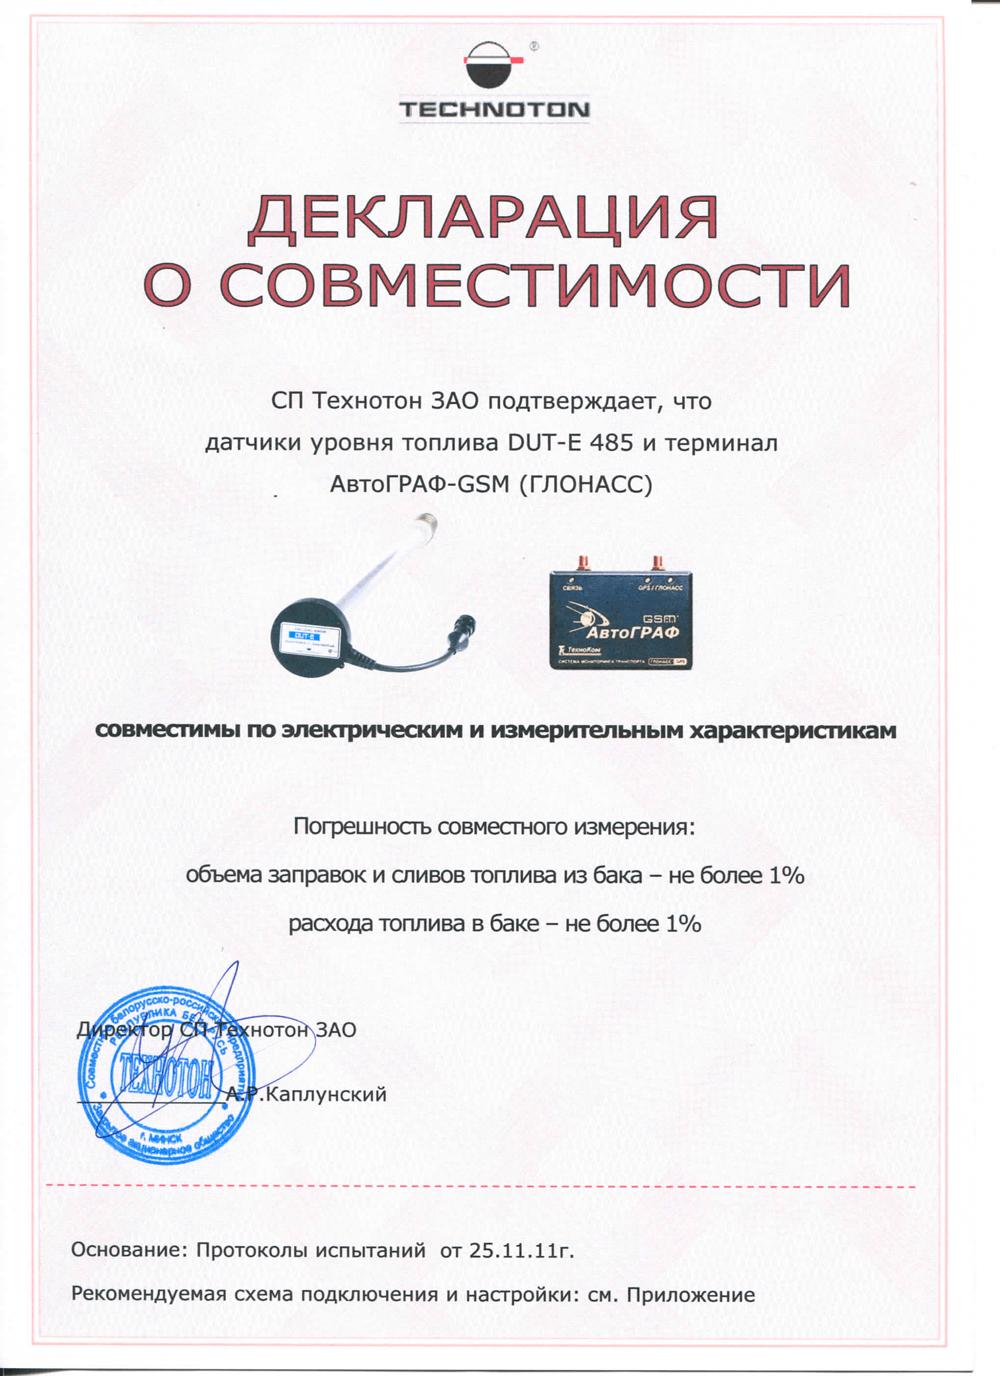 DUT-E 485 совместим с AvtoGRAF GSM GLONASS